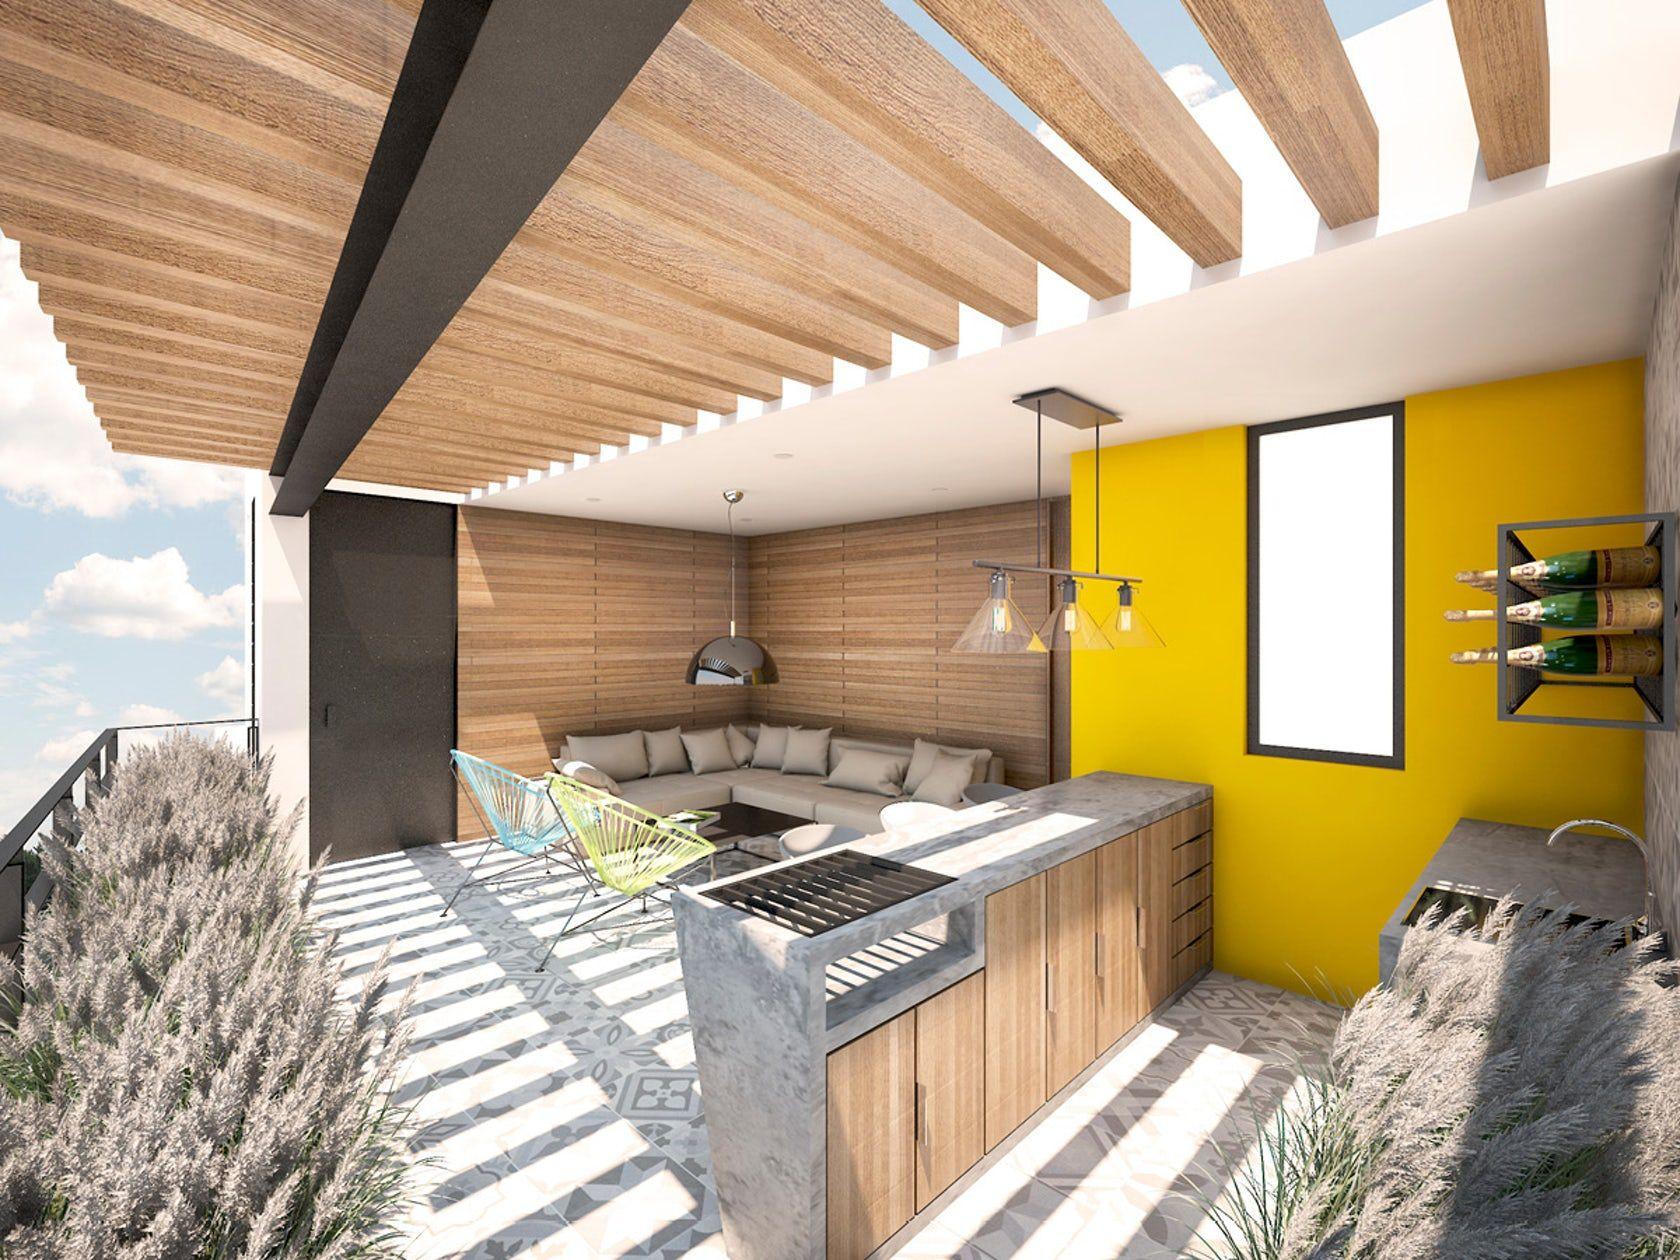 Terraza Cocina Cubierta Vigas De Madera Arquitectura